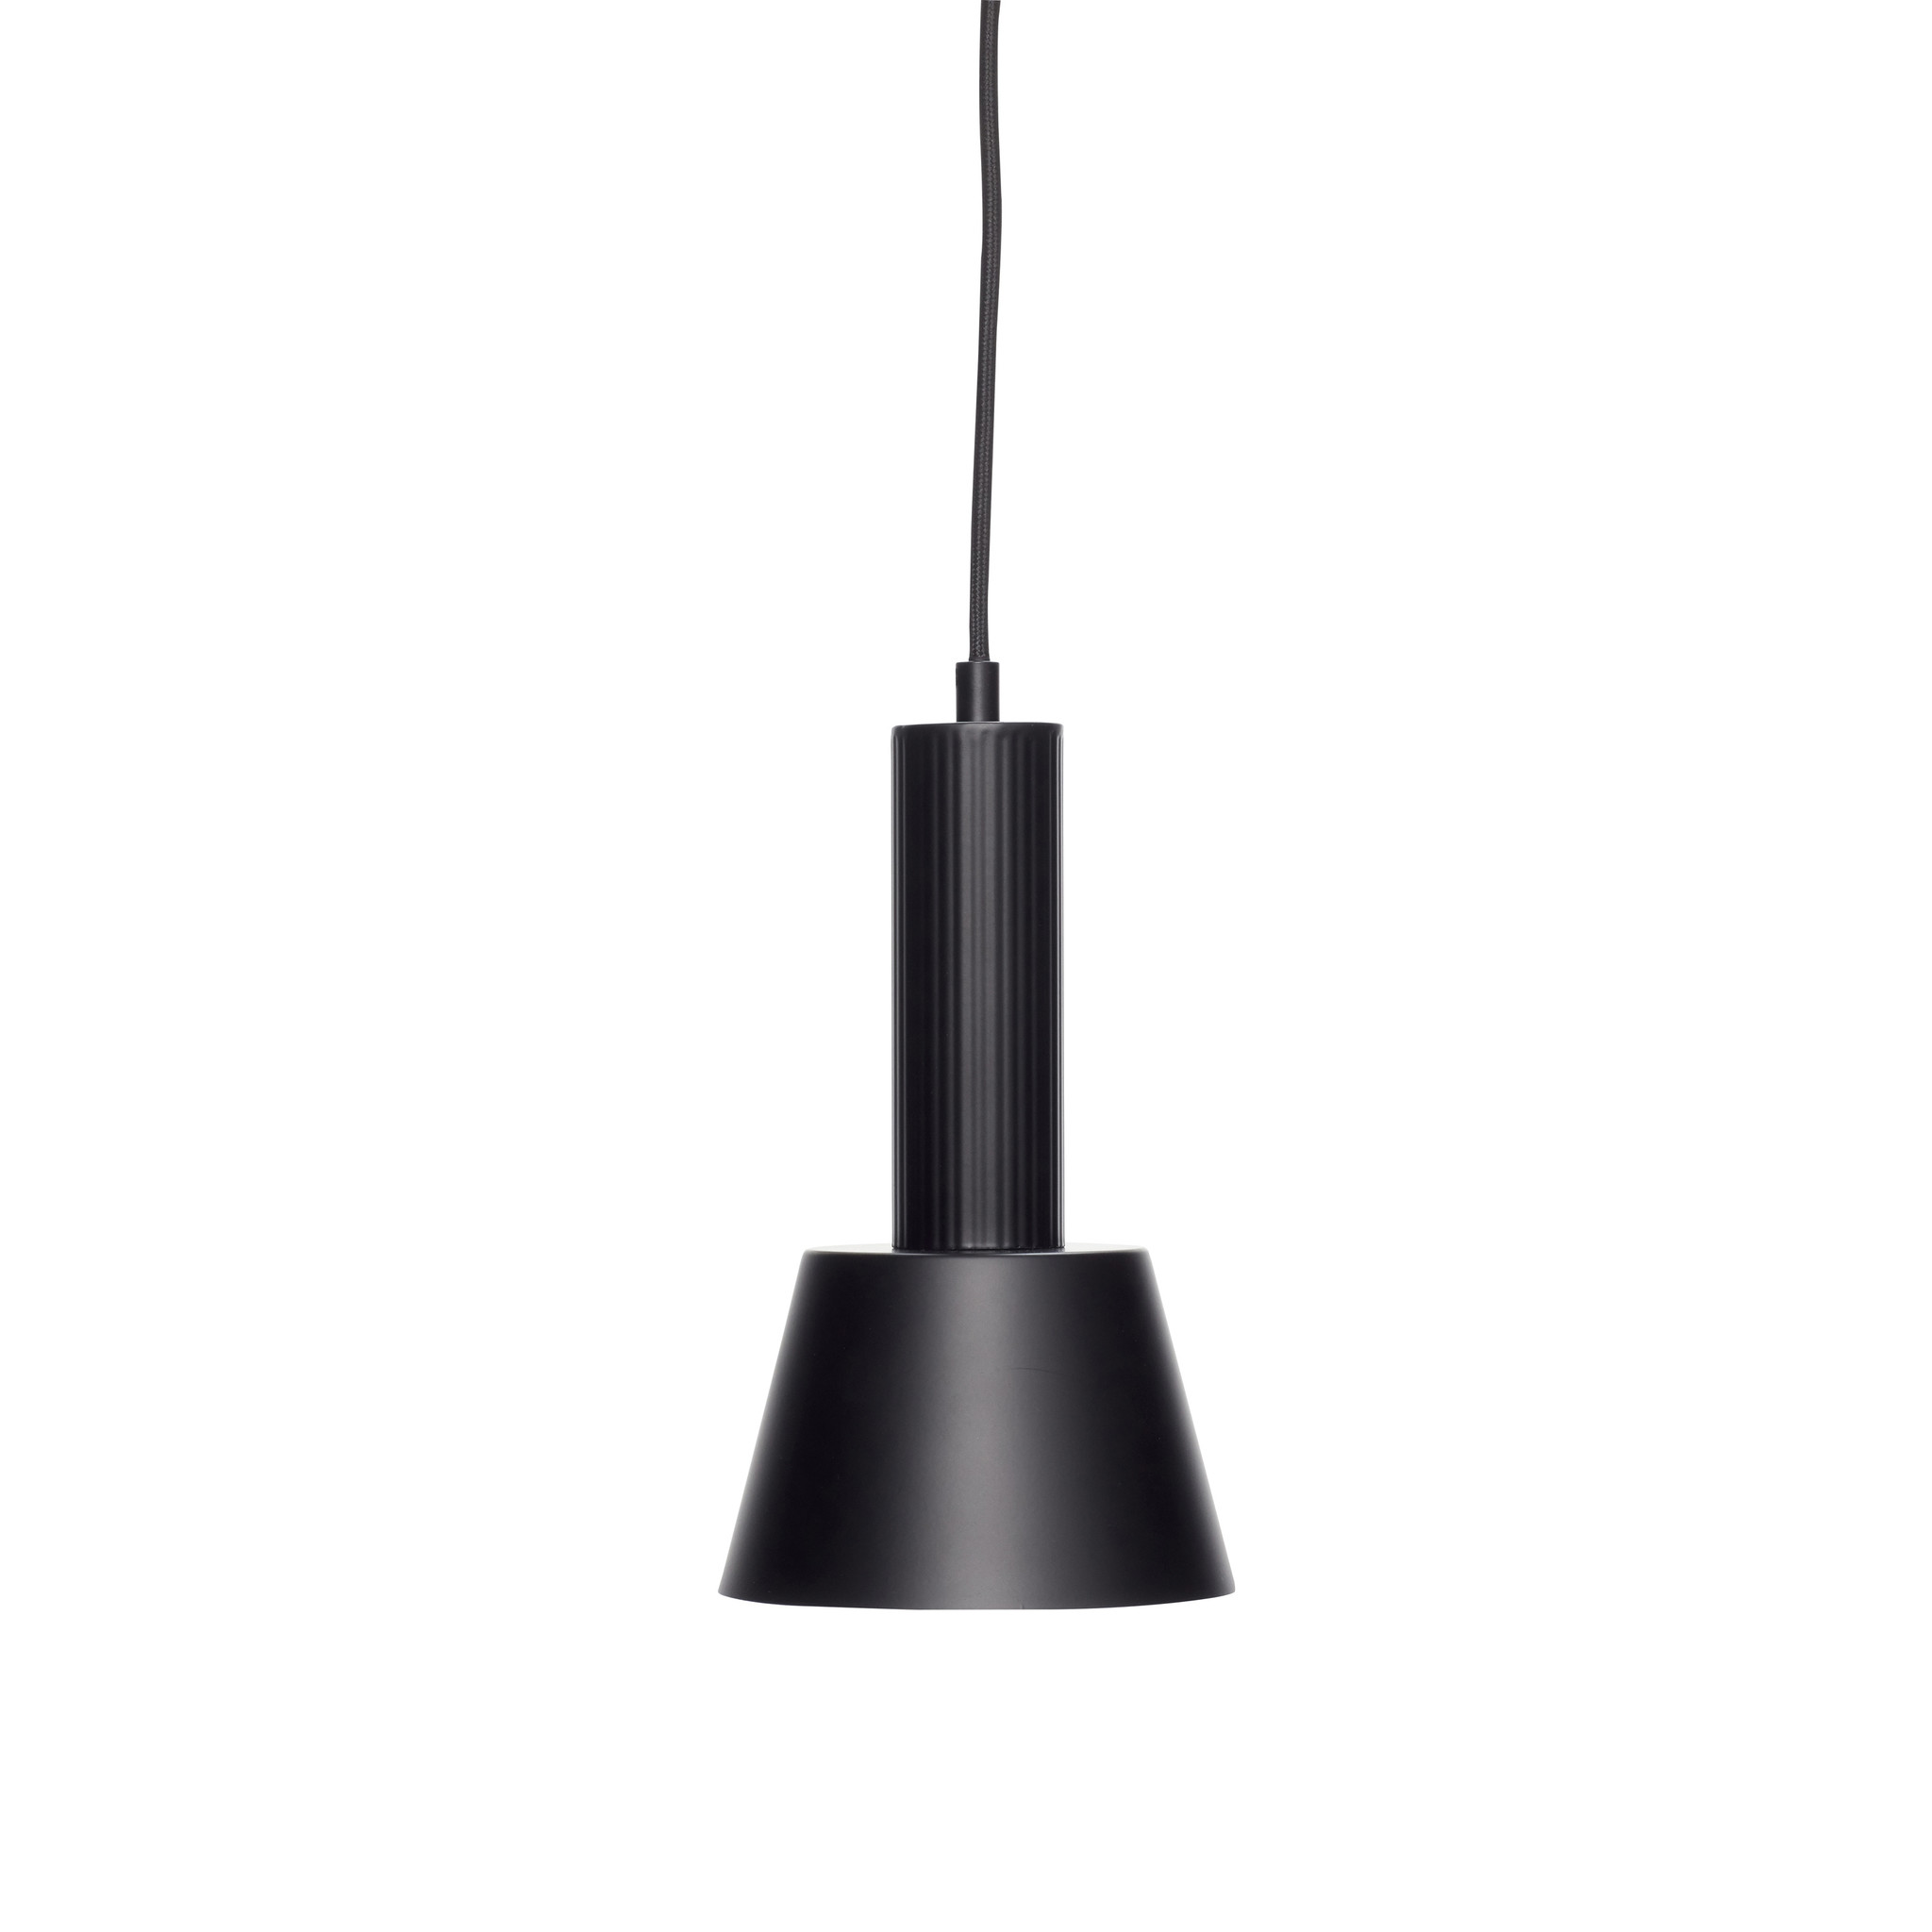 Hubsch Hanglamp metaal zwart-991113-5712772072615